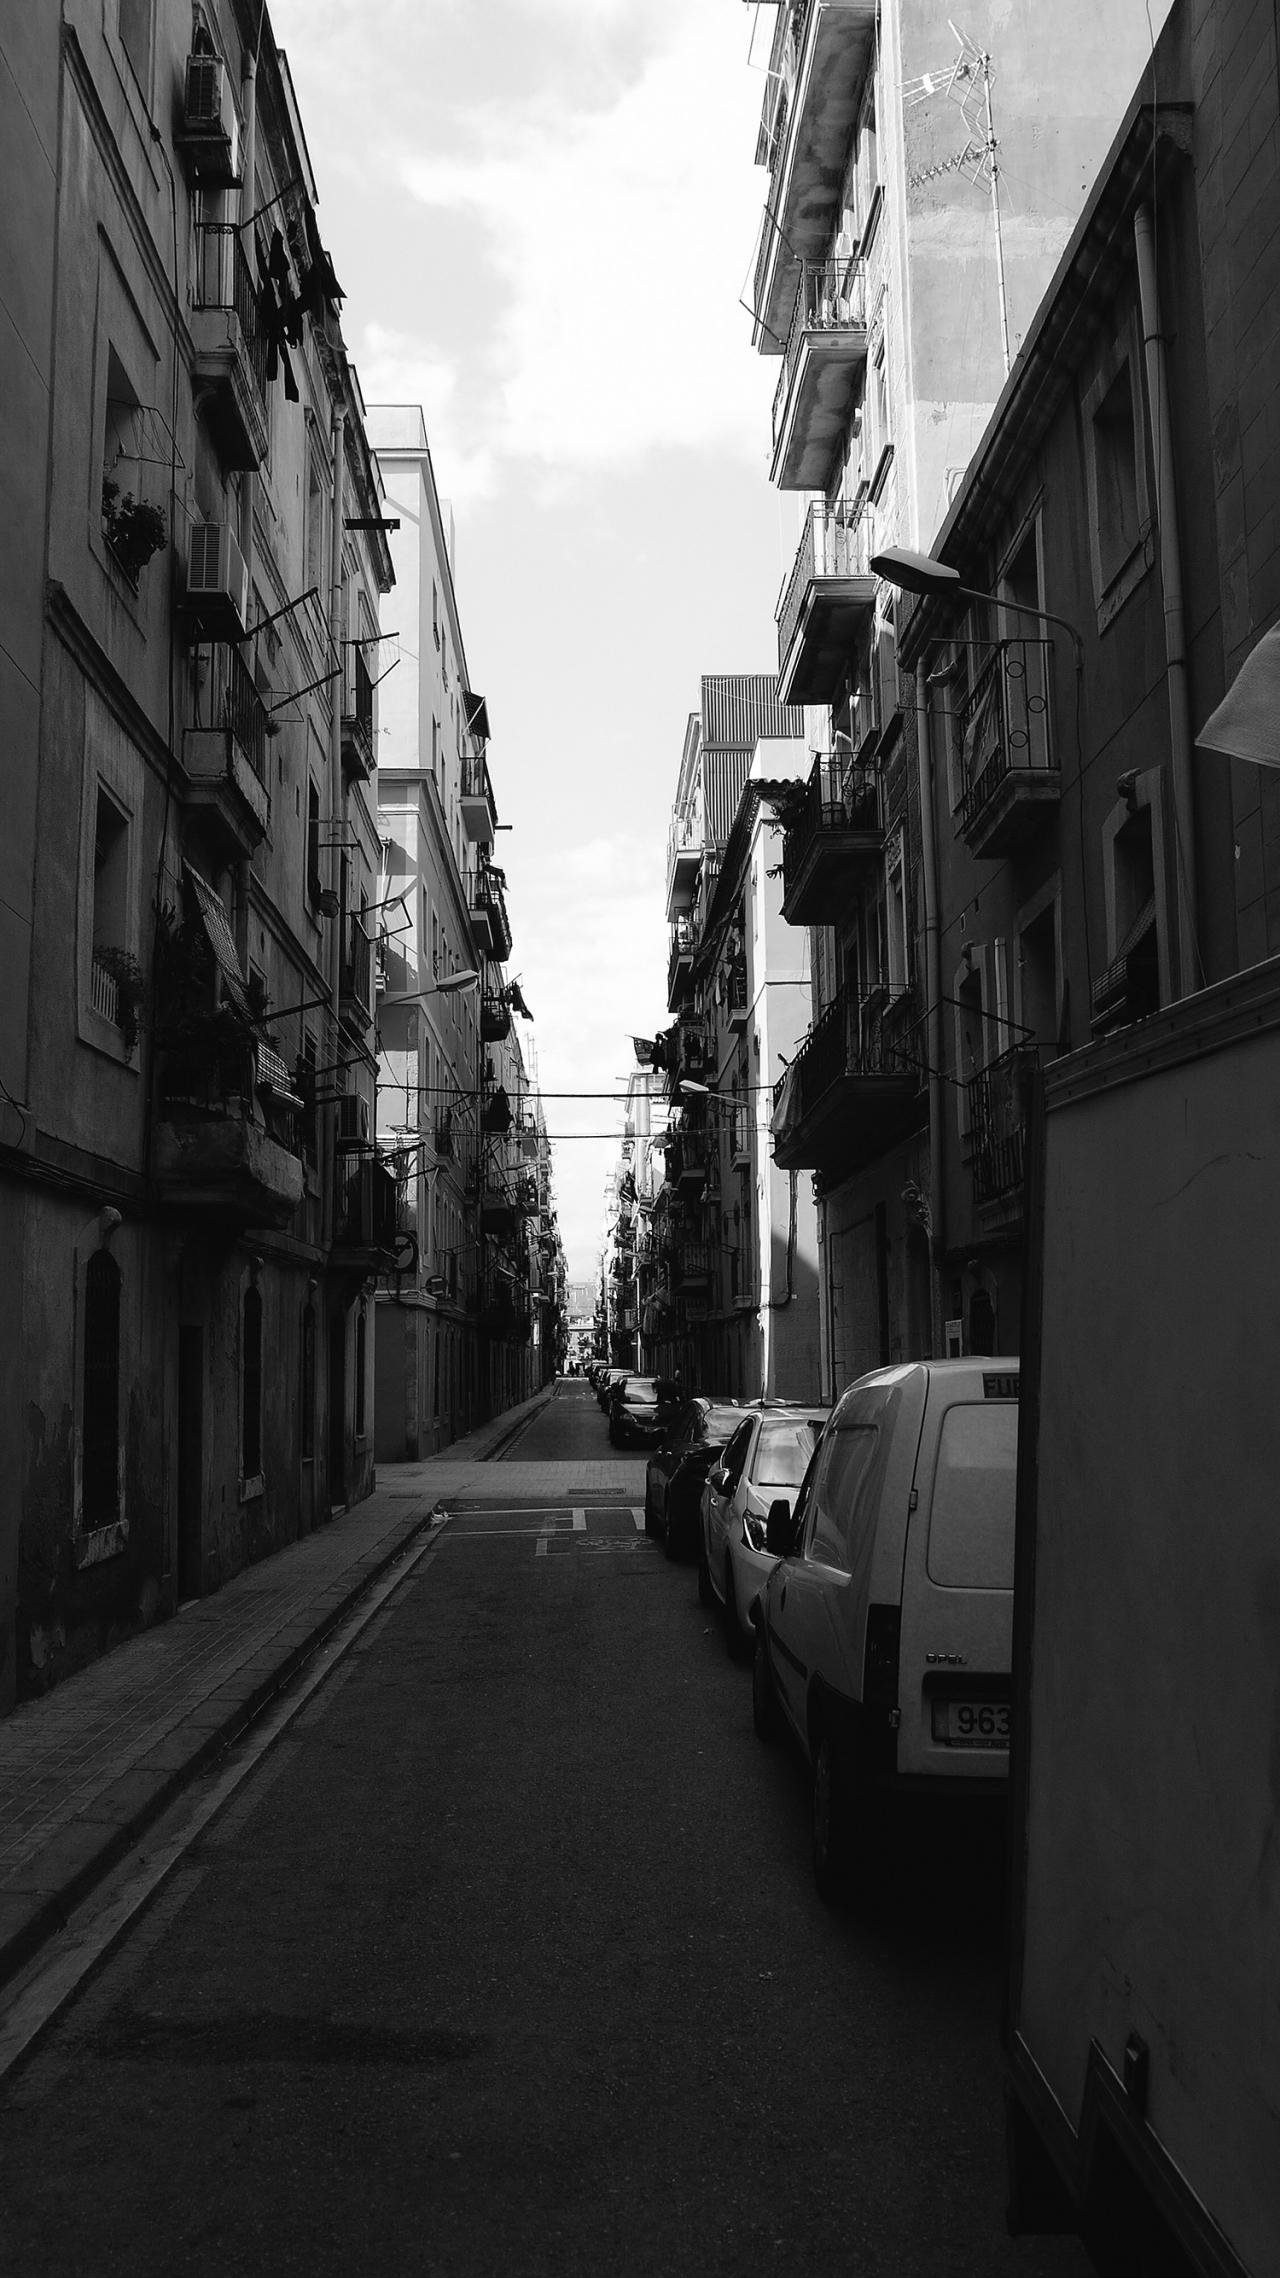 HORACIO LORENTE — Art Director SERIES 2 / EUROPE BROADCAST